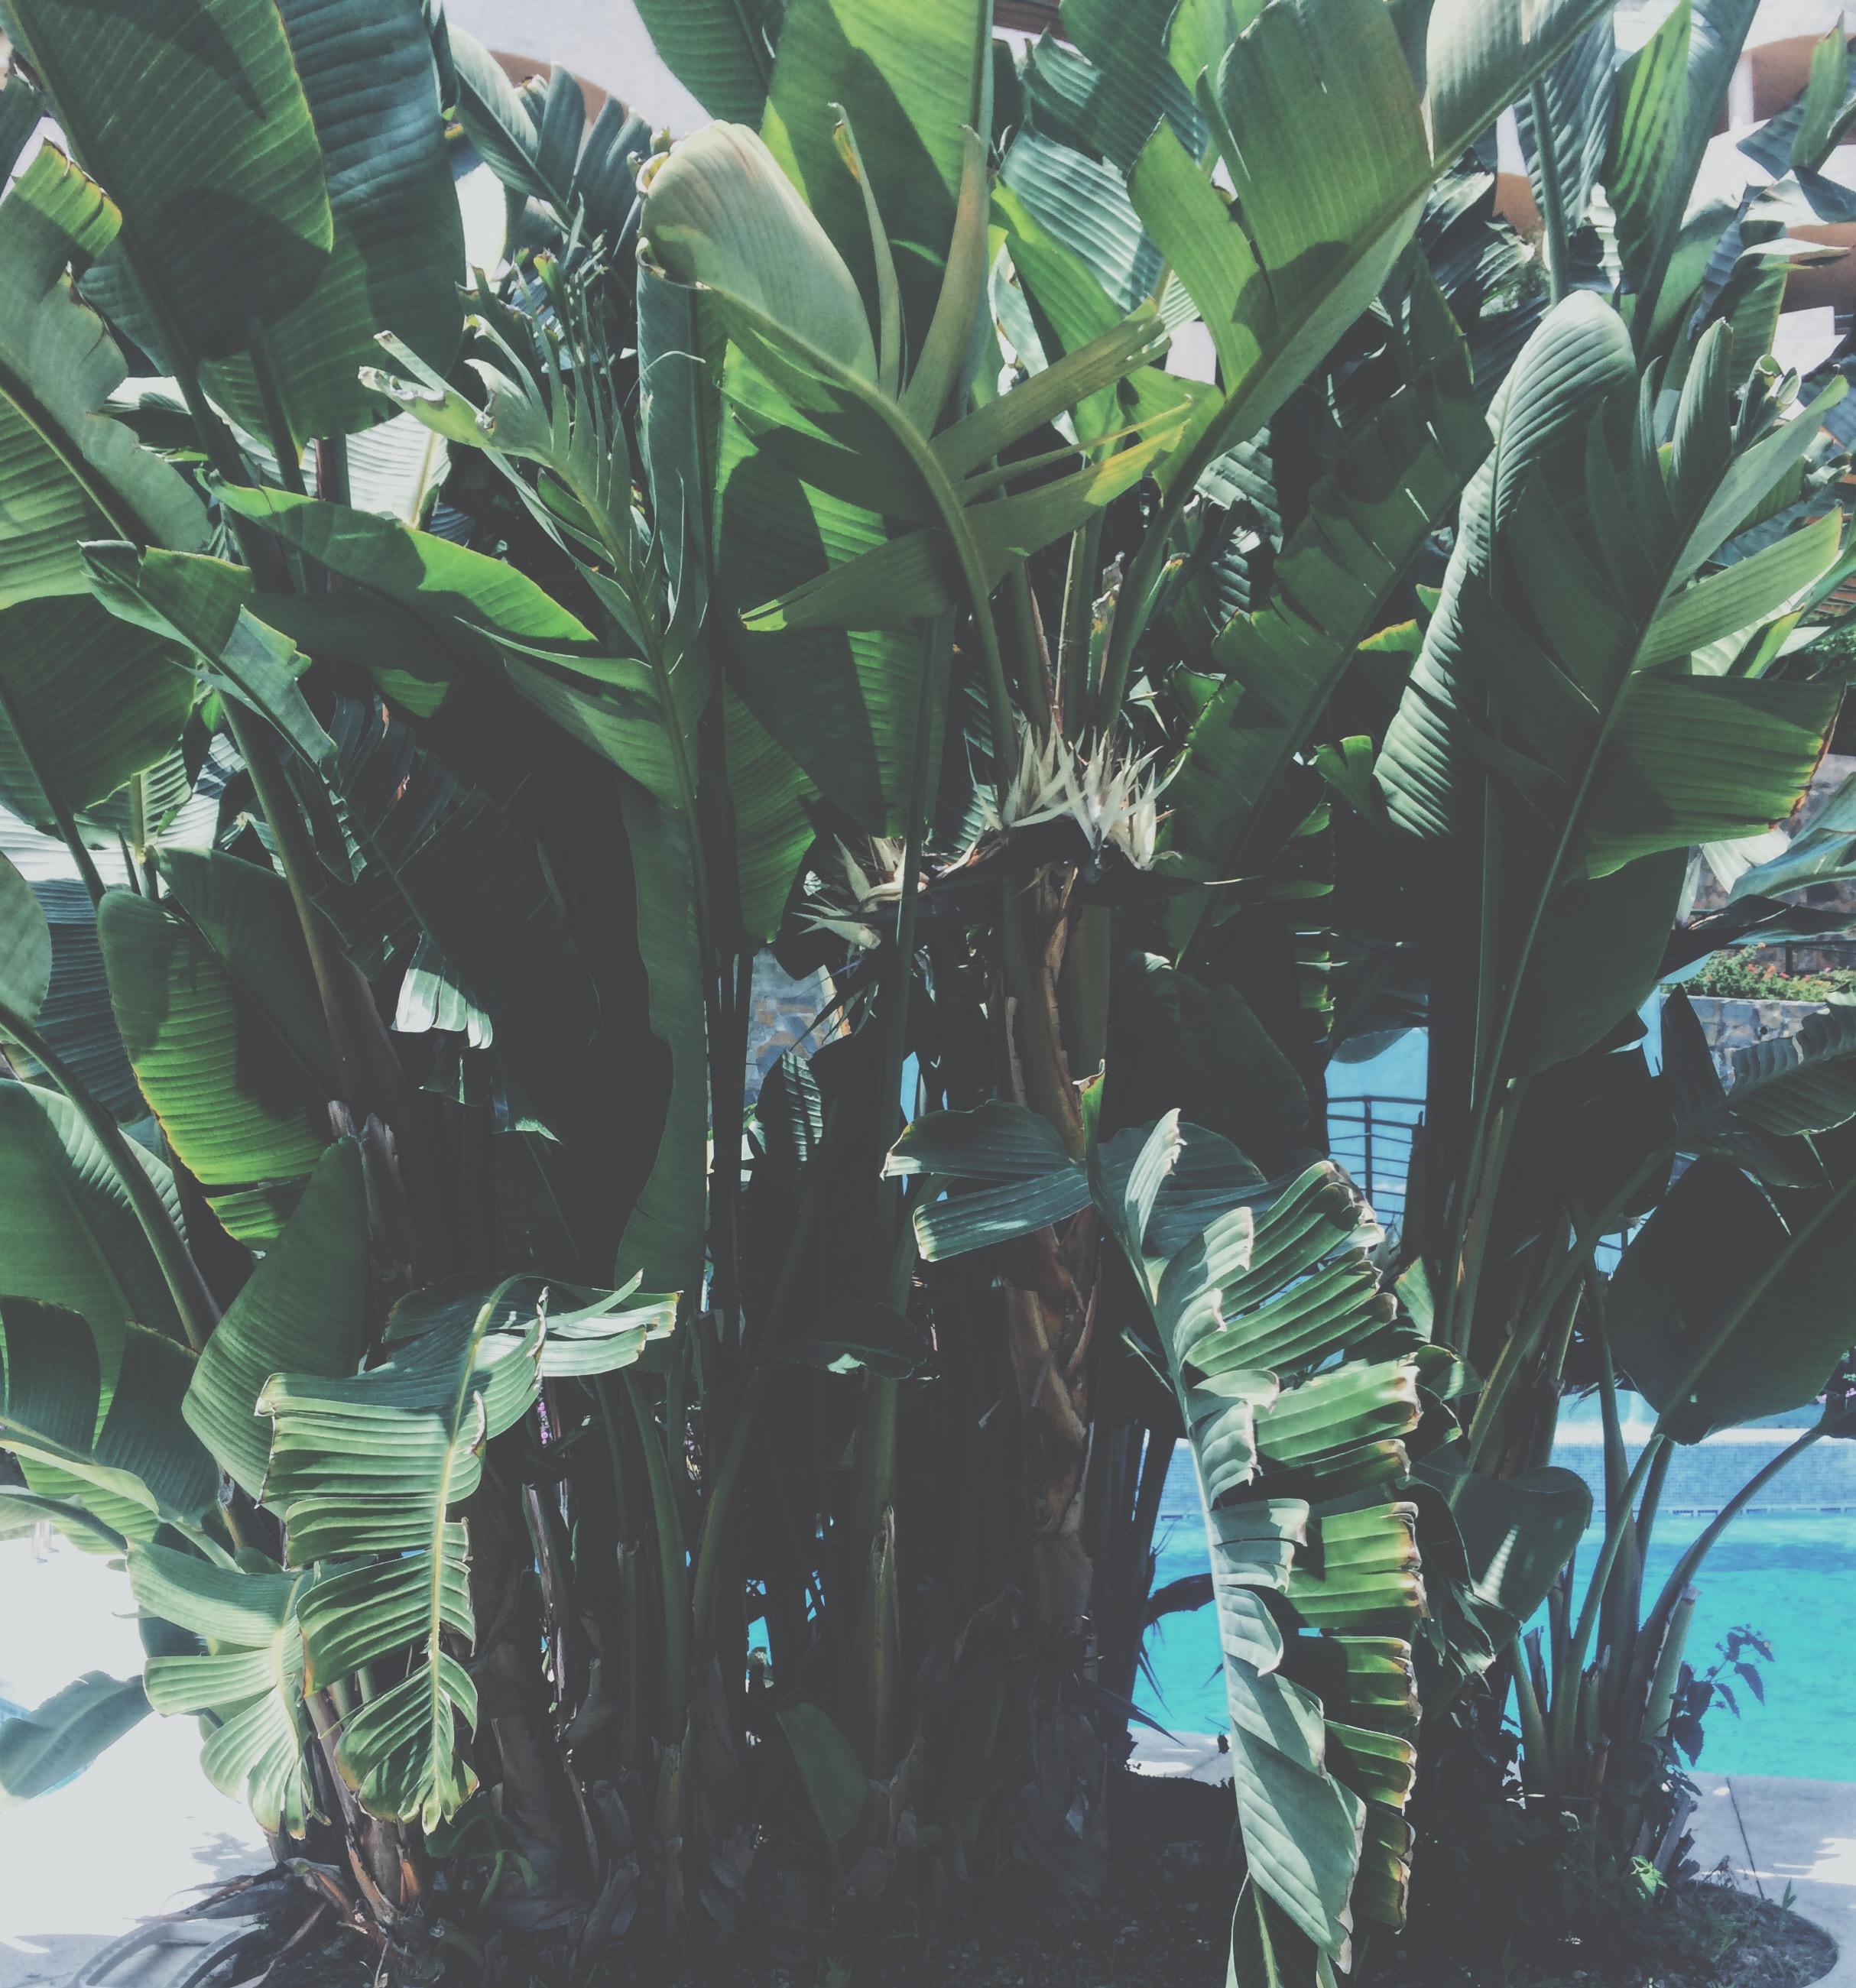 Marbella_Puerto_Banús_green_leaves